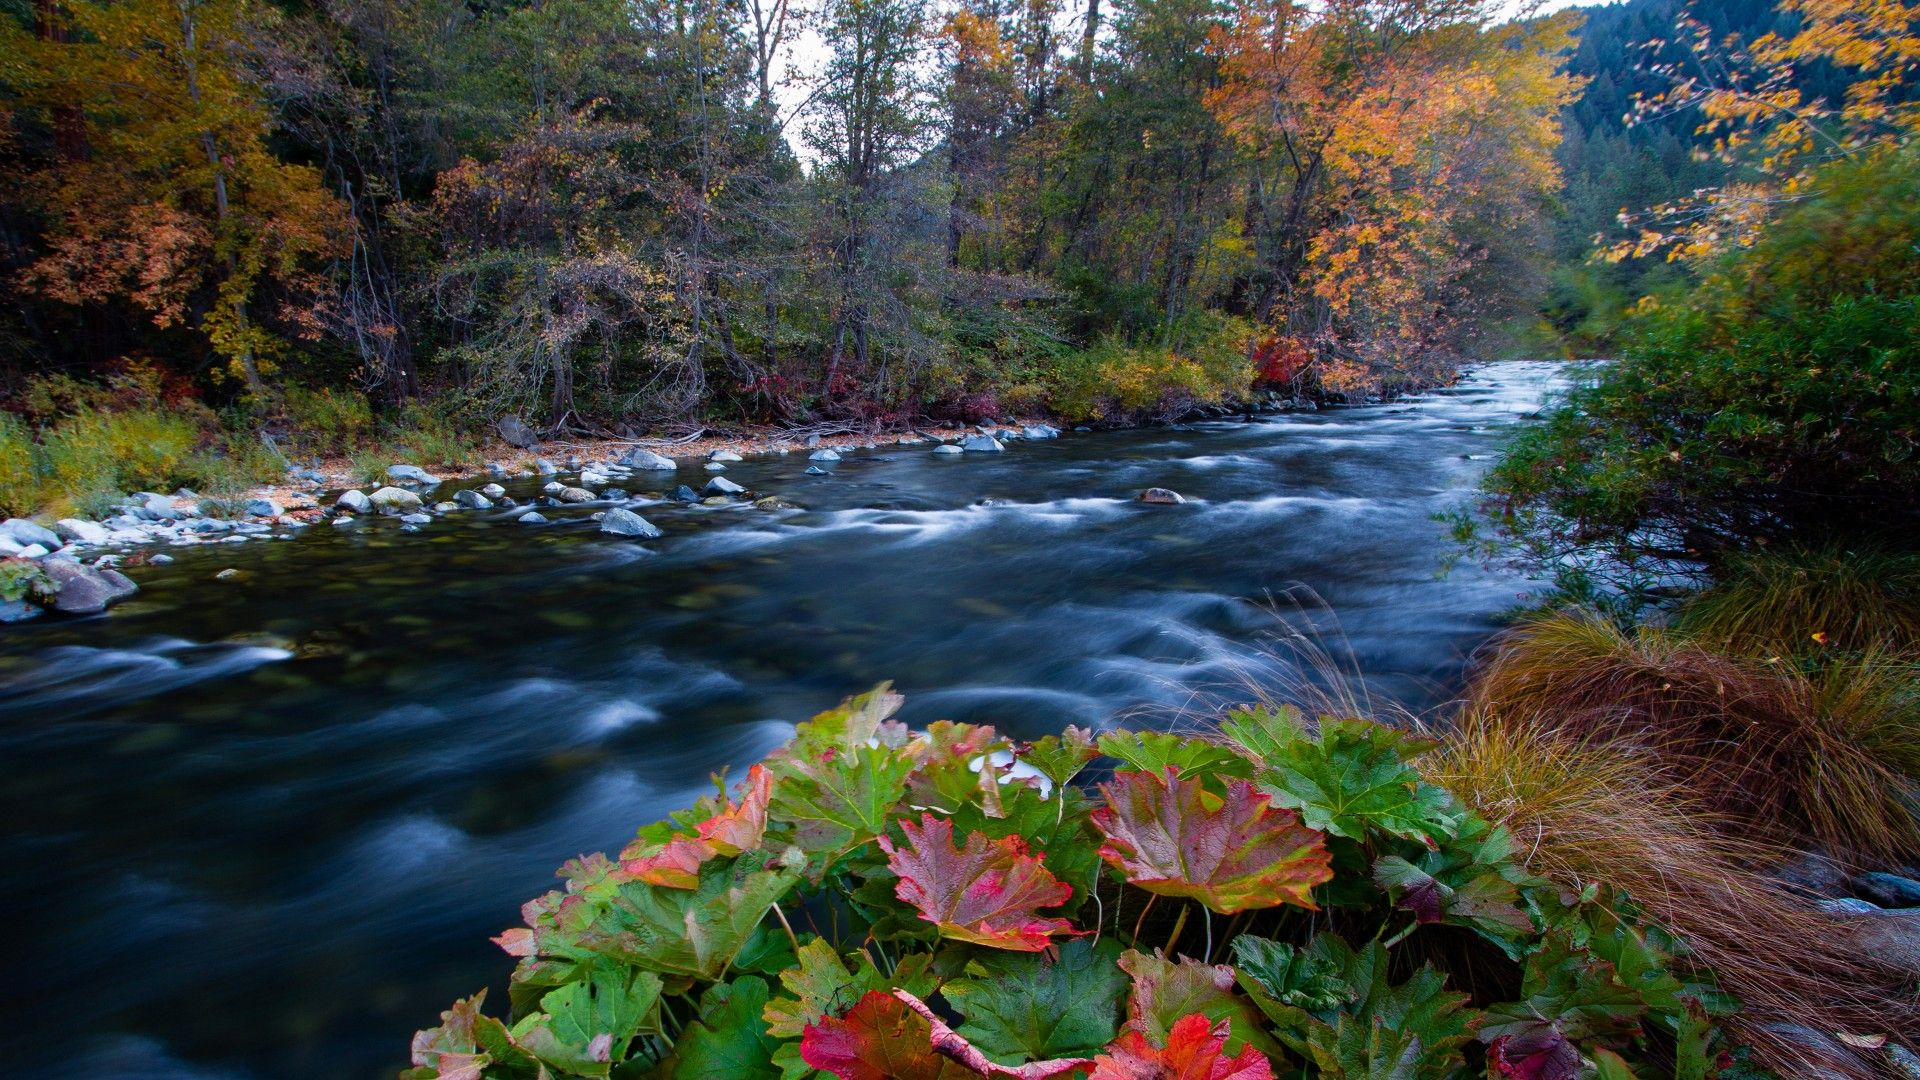 rivers forests autumn wallpaper [1920x1080] | Reddit HD Wallpapers | Autumn wallpaper hd ...